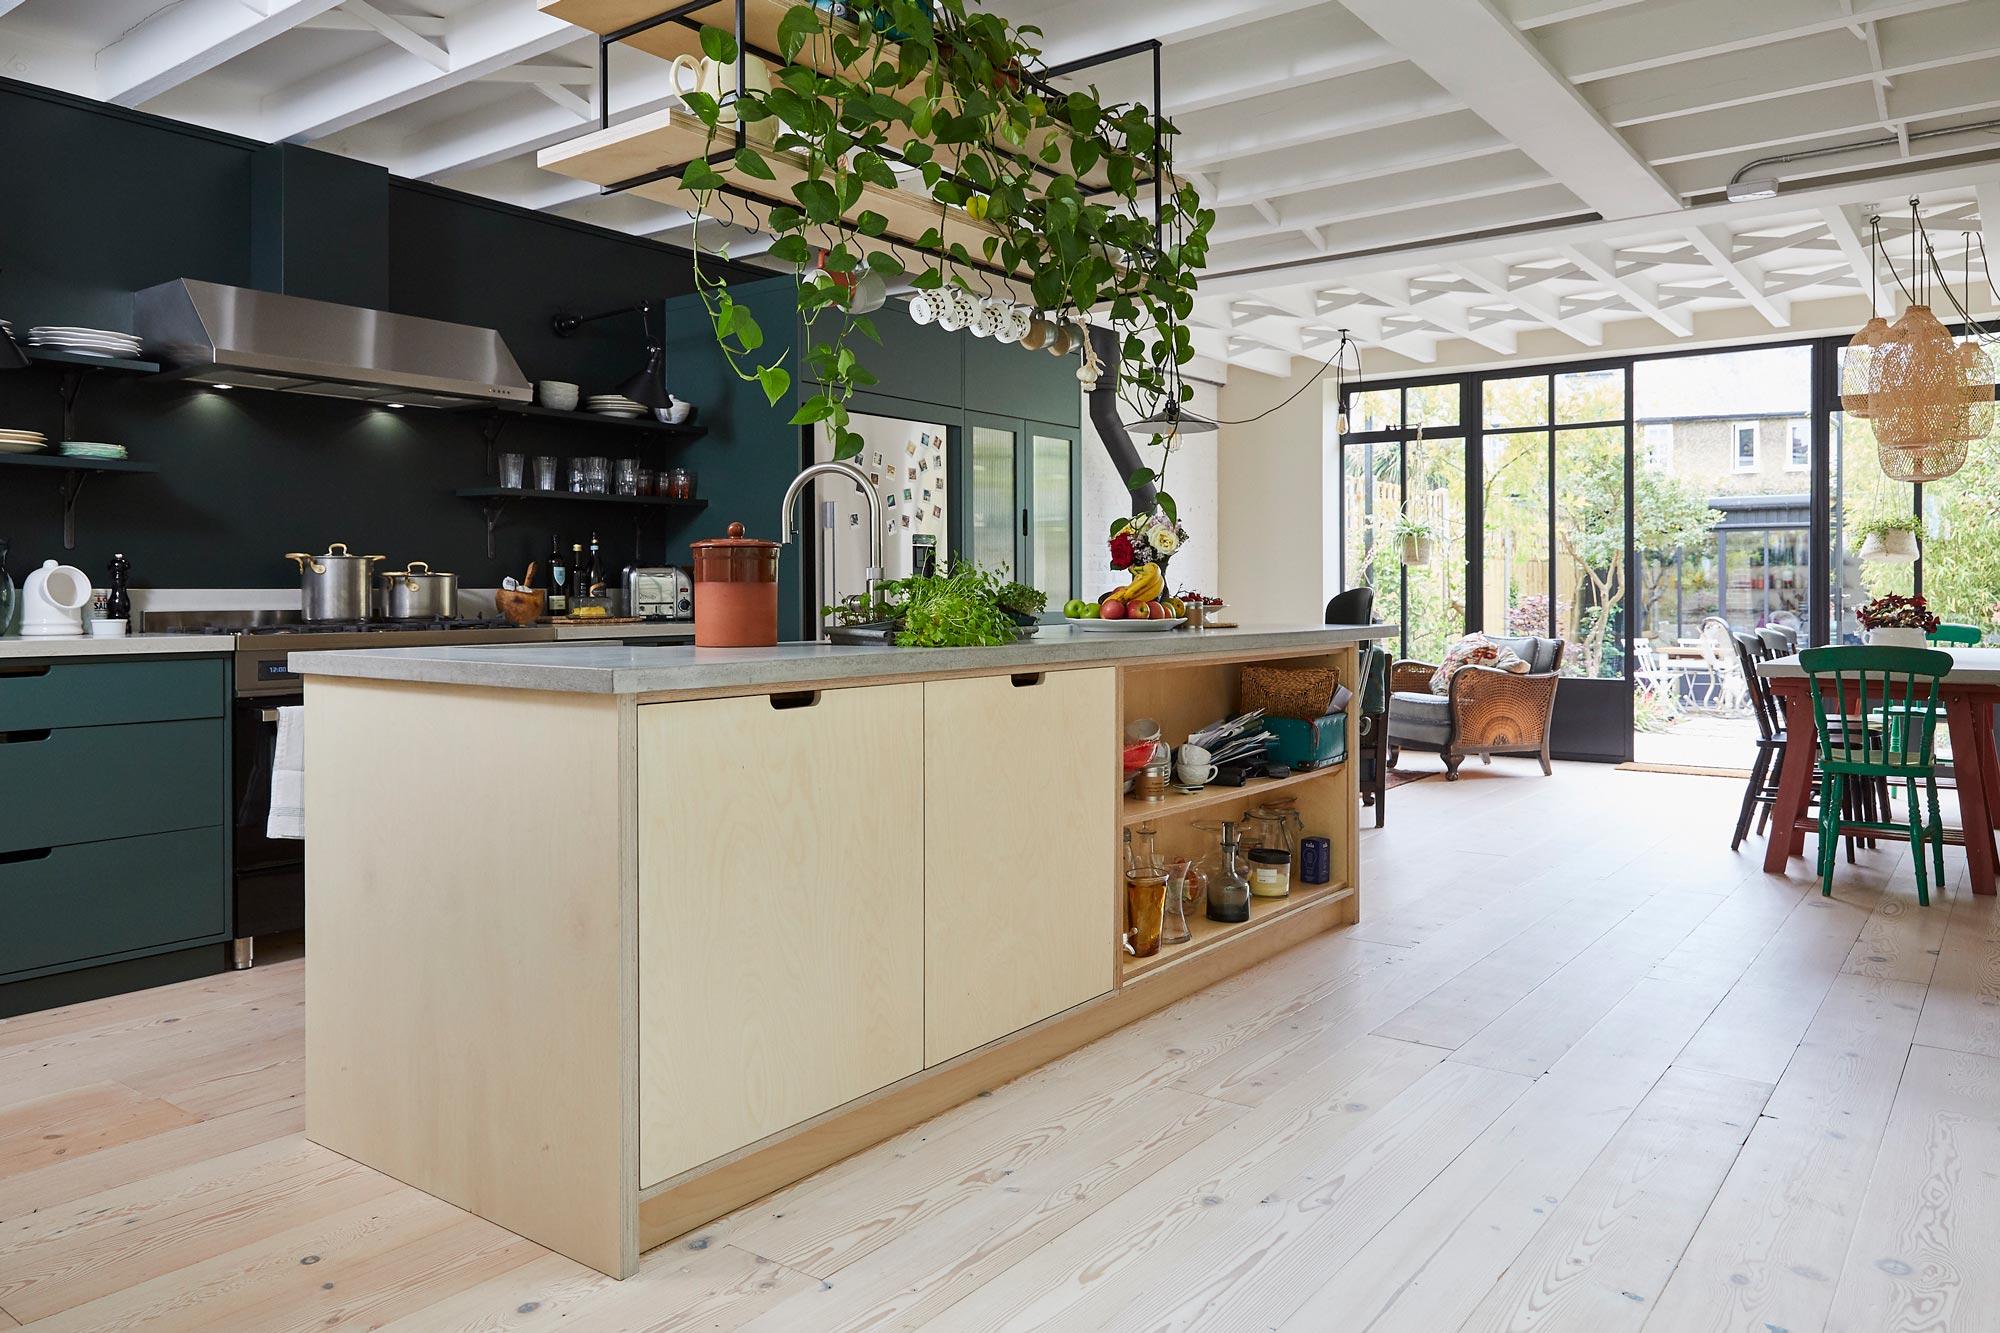 Birch plywood kitchen island with solid concrete worktops